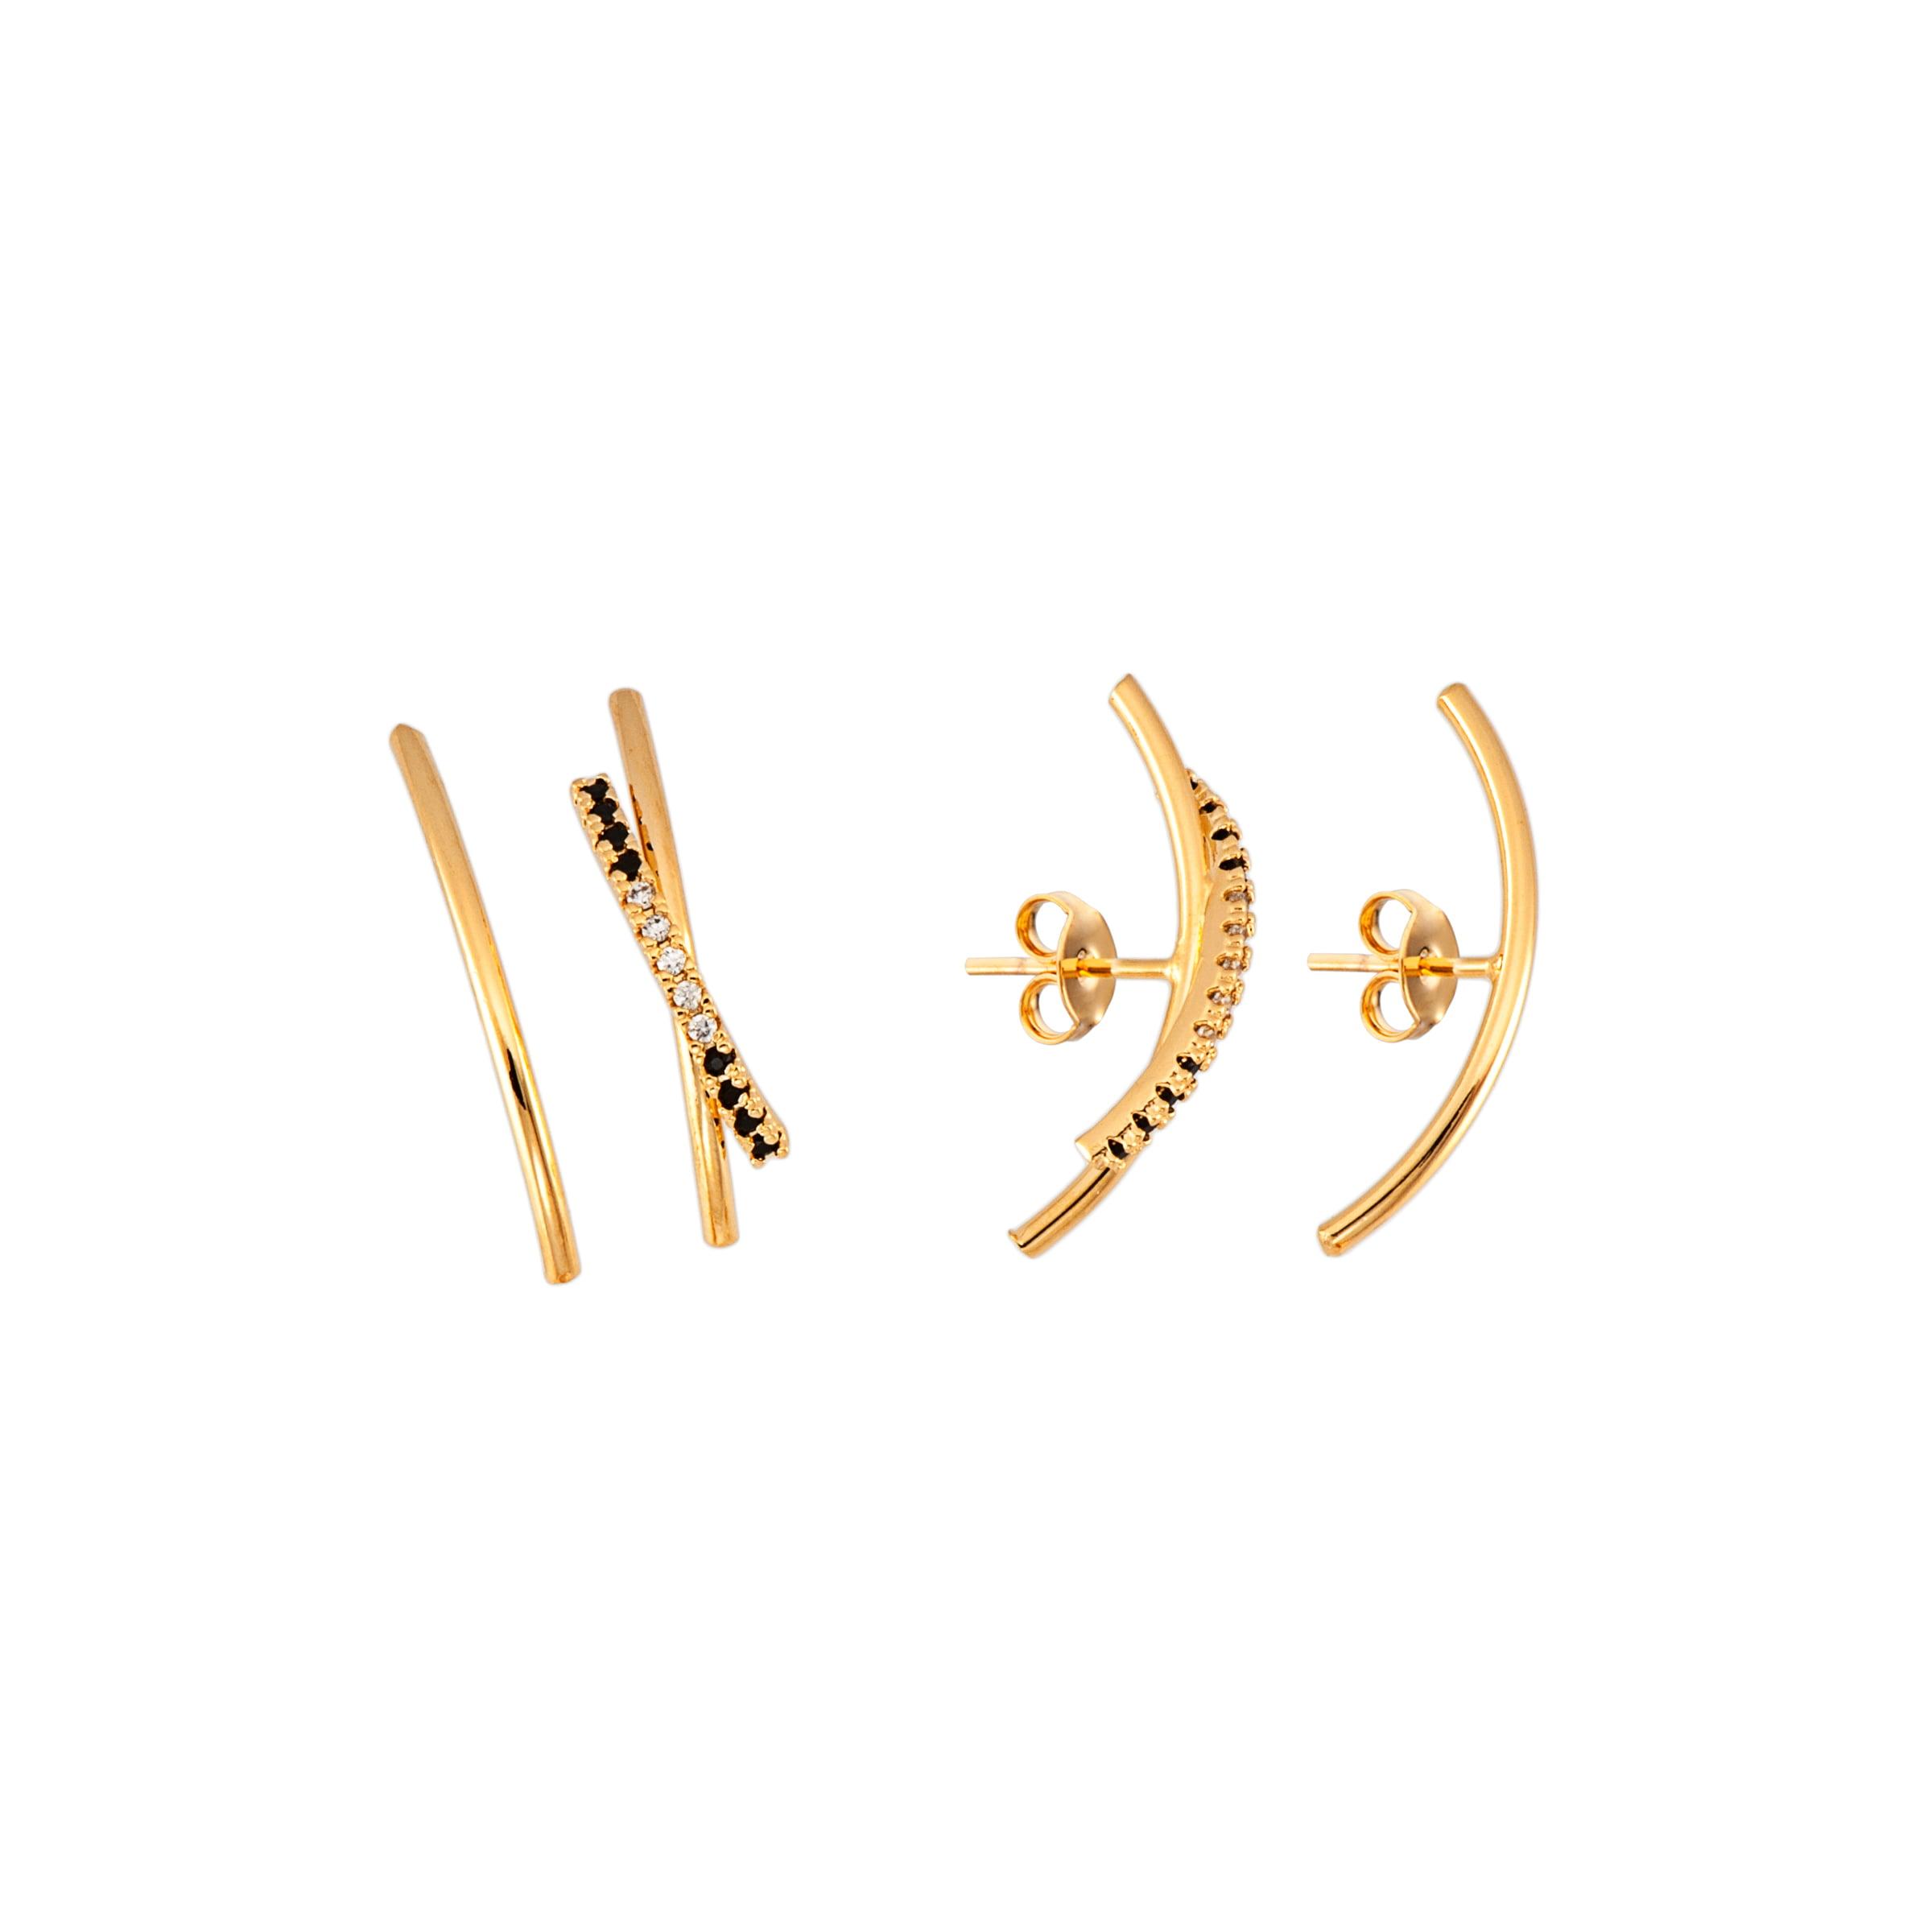 Brinco Ear Hook Rafalu - 5 anos de Garantia -  BR0001N1